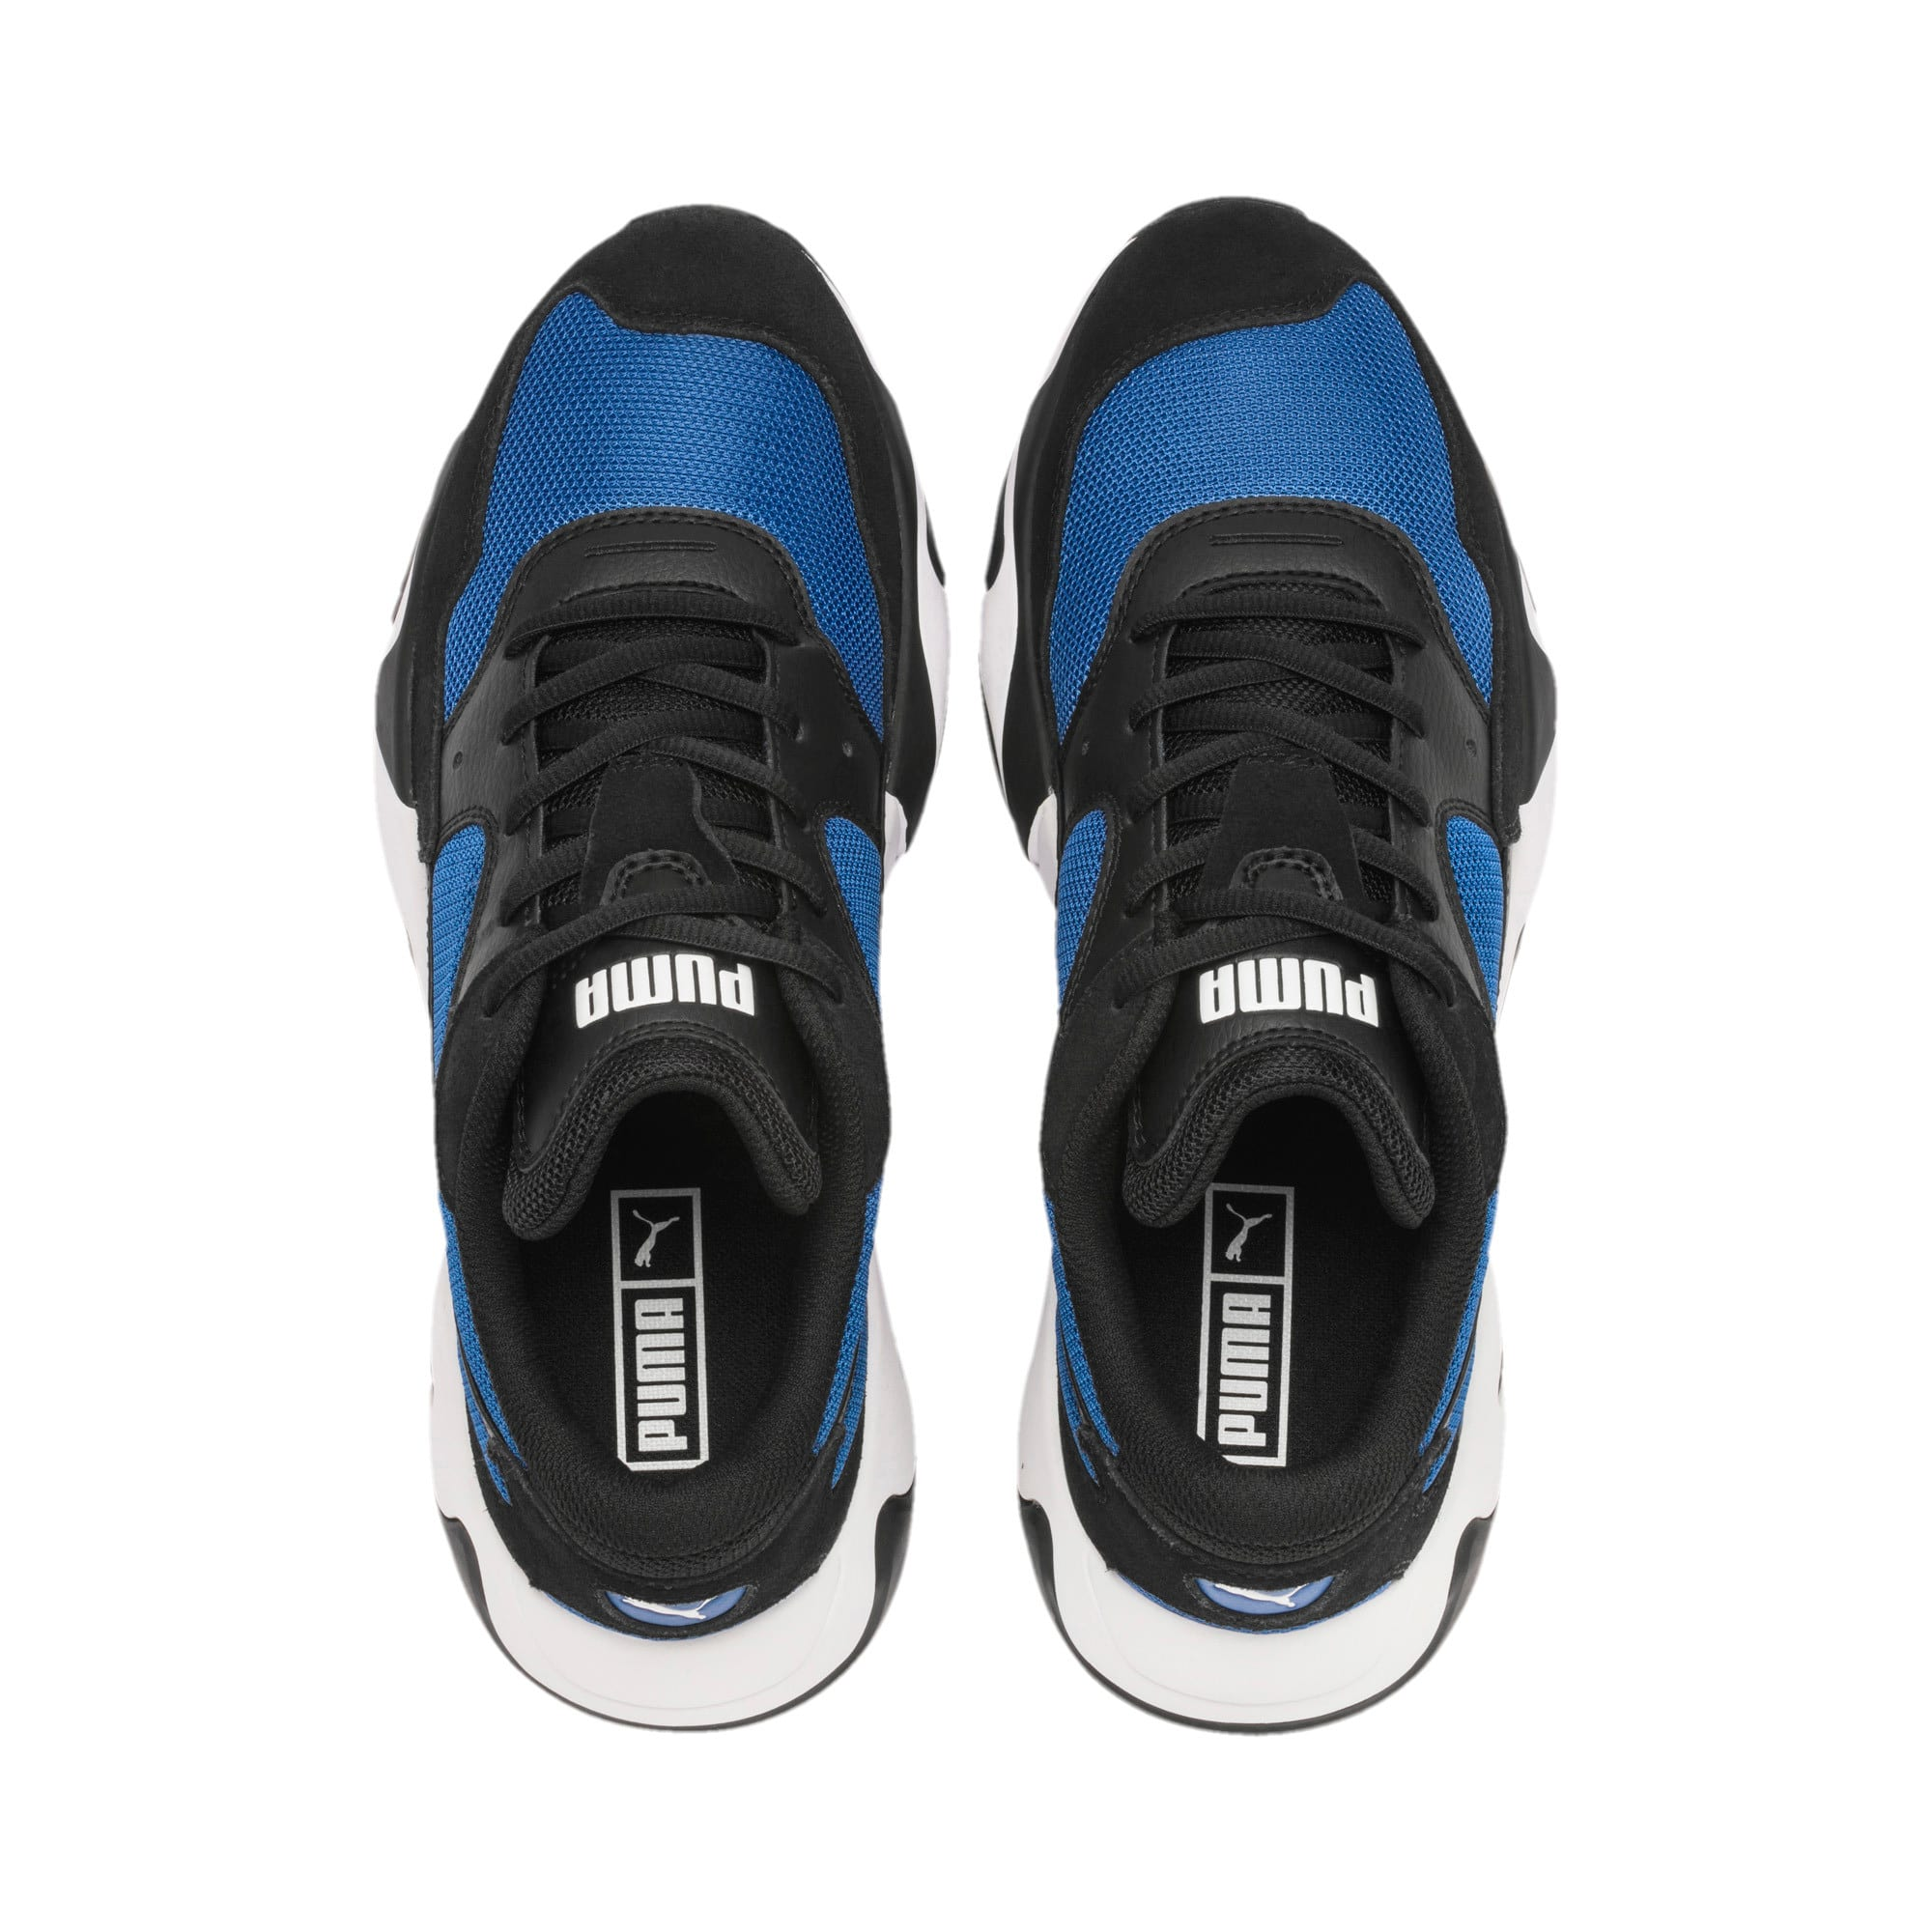 Thumbnail 9 of Storm Adrenaline Sneakers, Puma Black-Galaxy Blue, medium